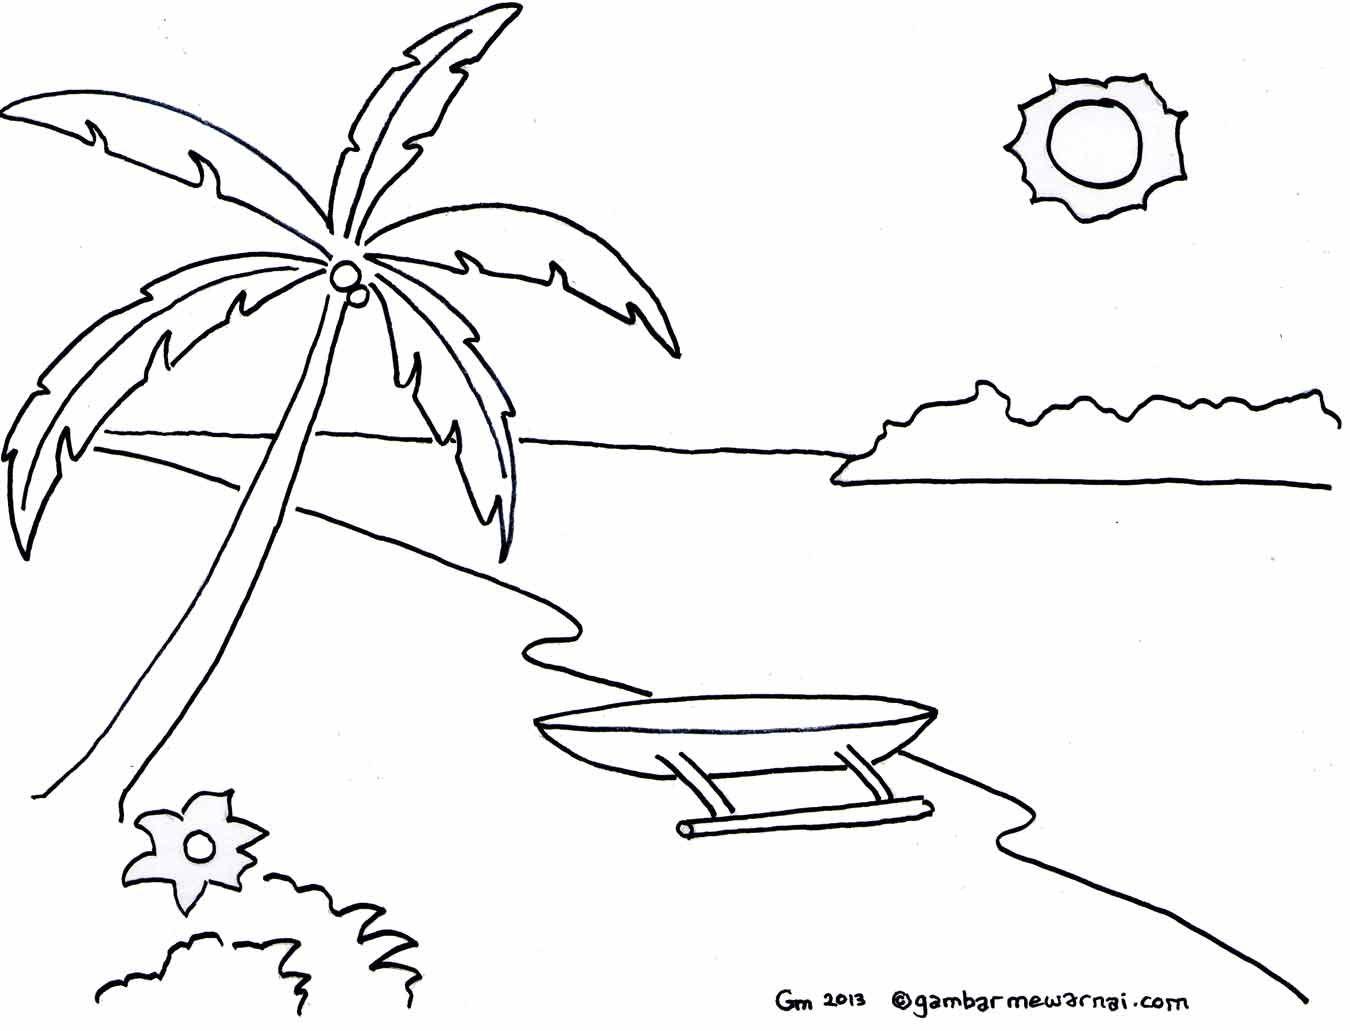 Mewarnai Gambar Pemandangan Pantai Buku Gambar Pemandangan